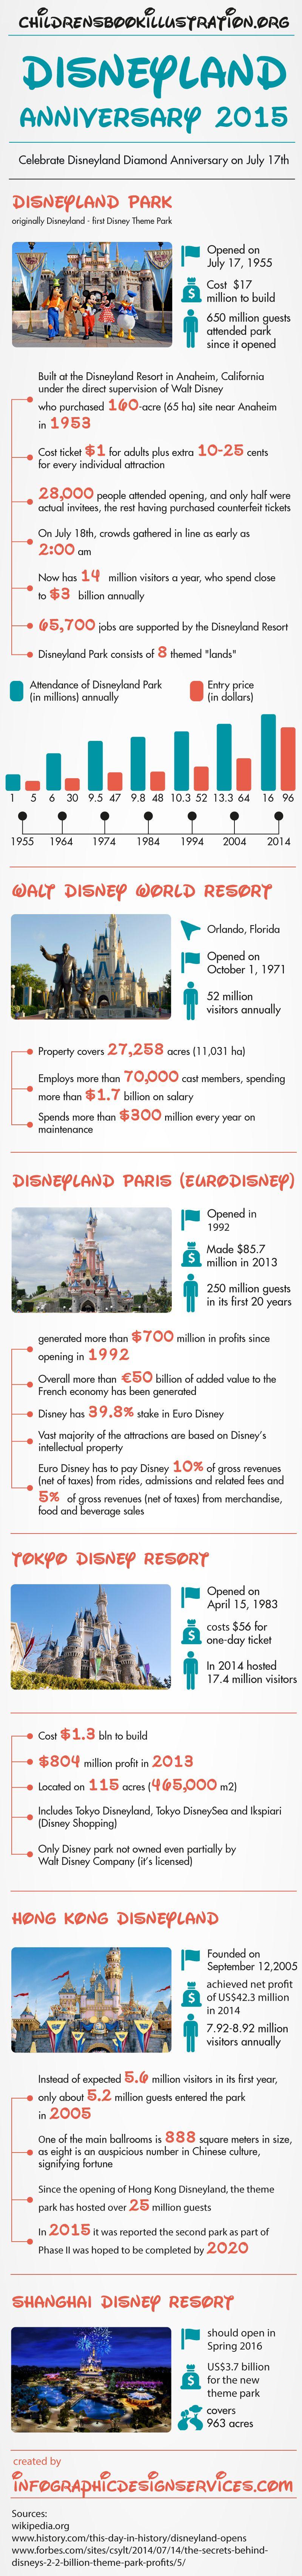 Disneyland Anniversary 2015 - Disney Theme Parks